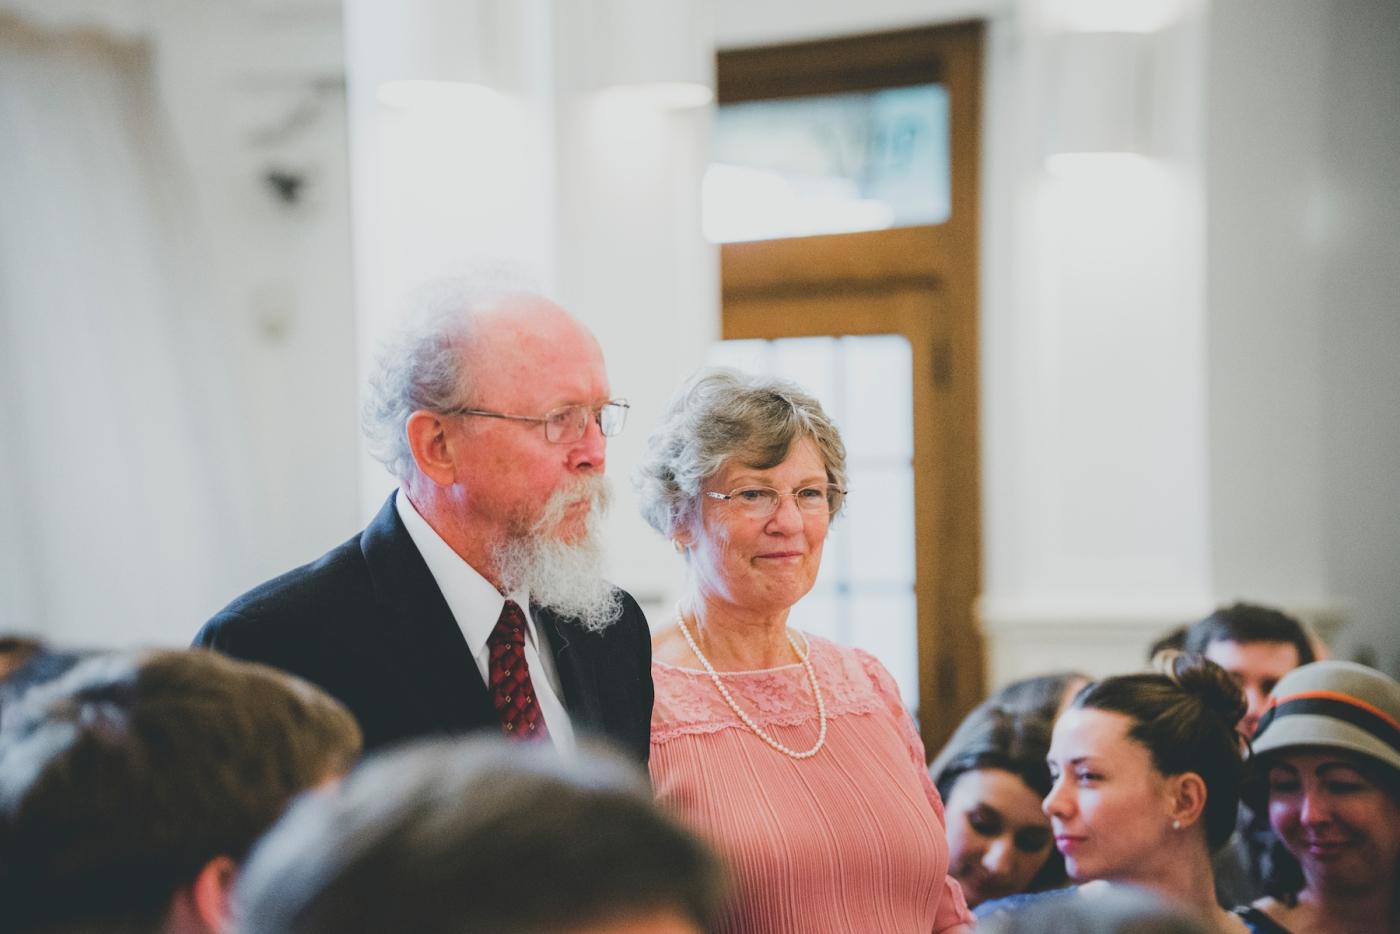 DSC_2510Everett_Wedding_Ballroom_Jane_Speleers_photography_Rachel_and_Edmund_Ceremony_2017